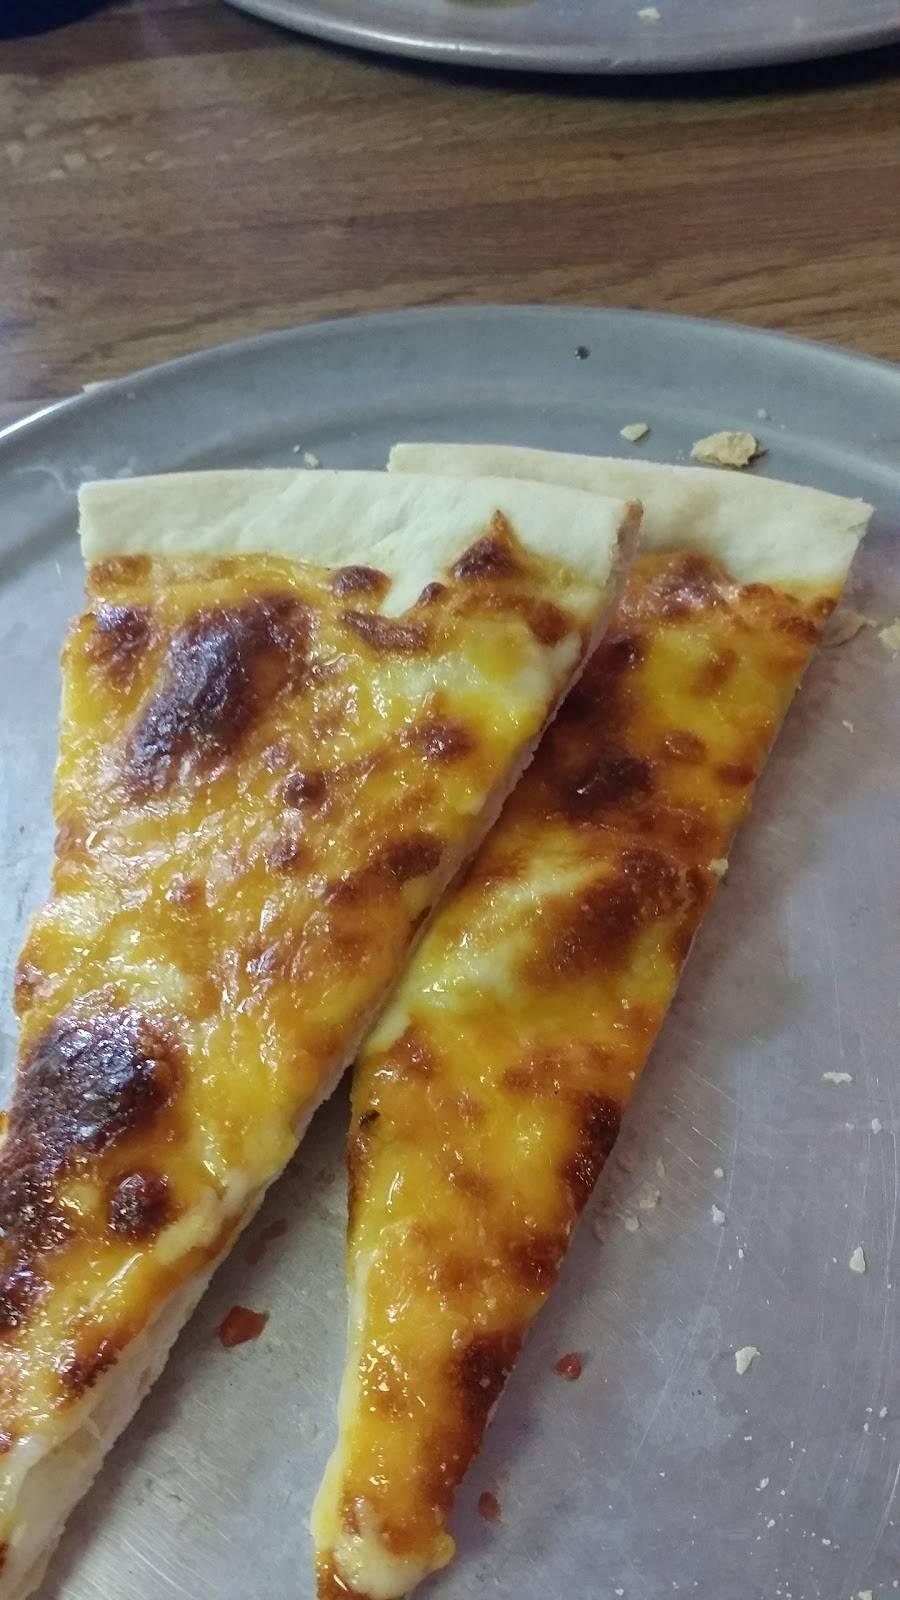 Pizza Barn | restaurant | 515 W Walnut St, Paris, AR 72855, USA | 4799633334 OR +1 479-963-3334